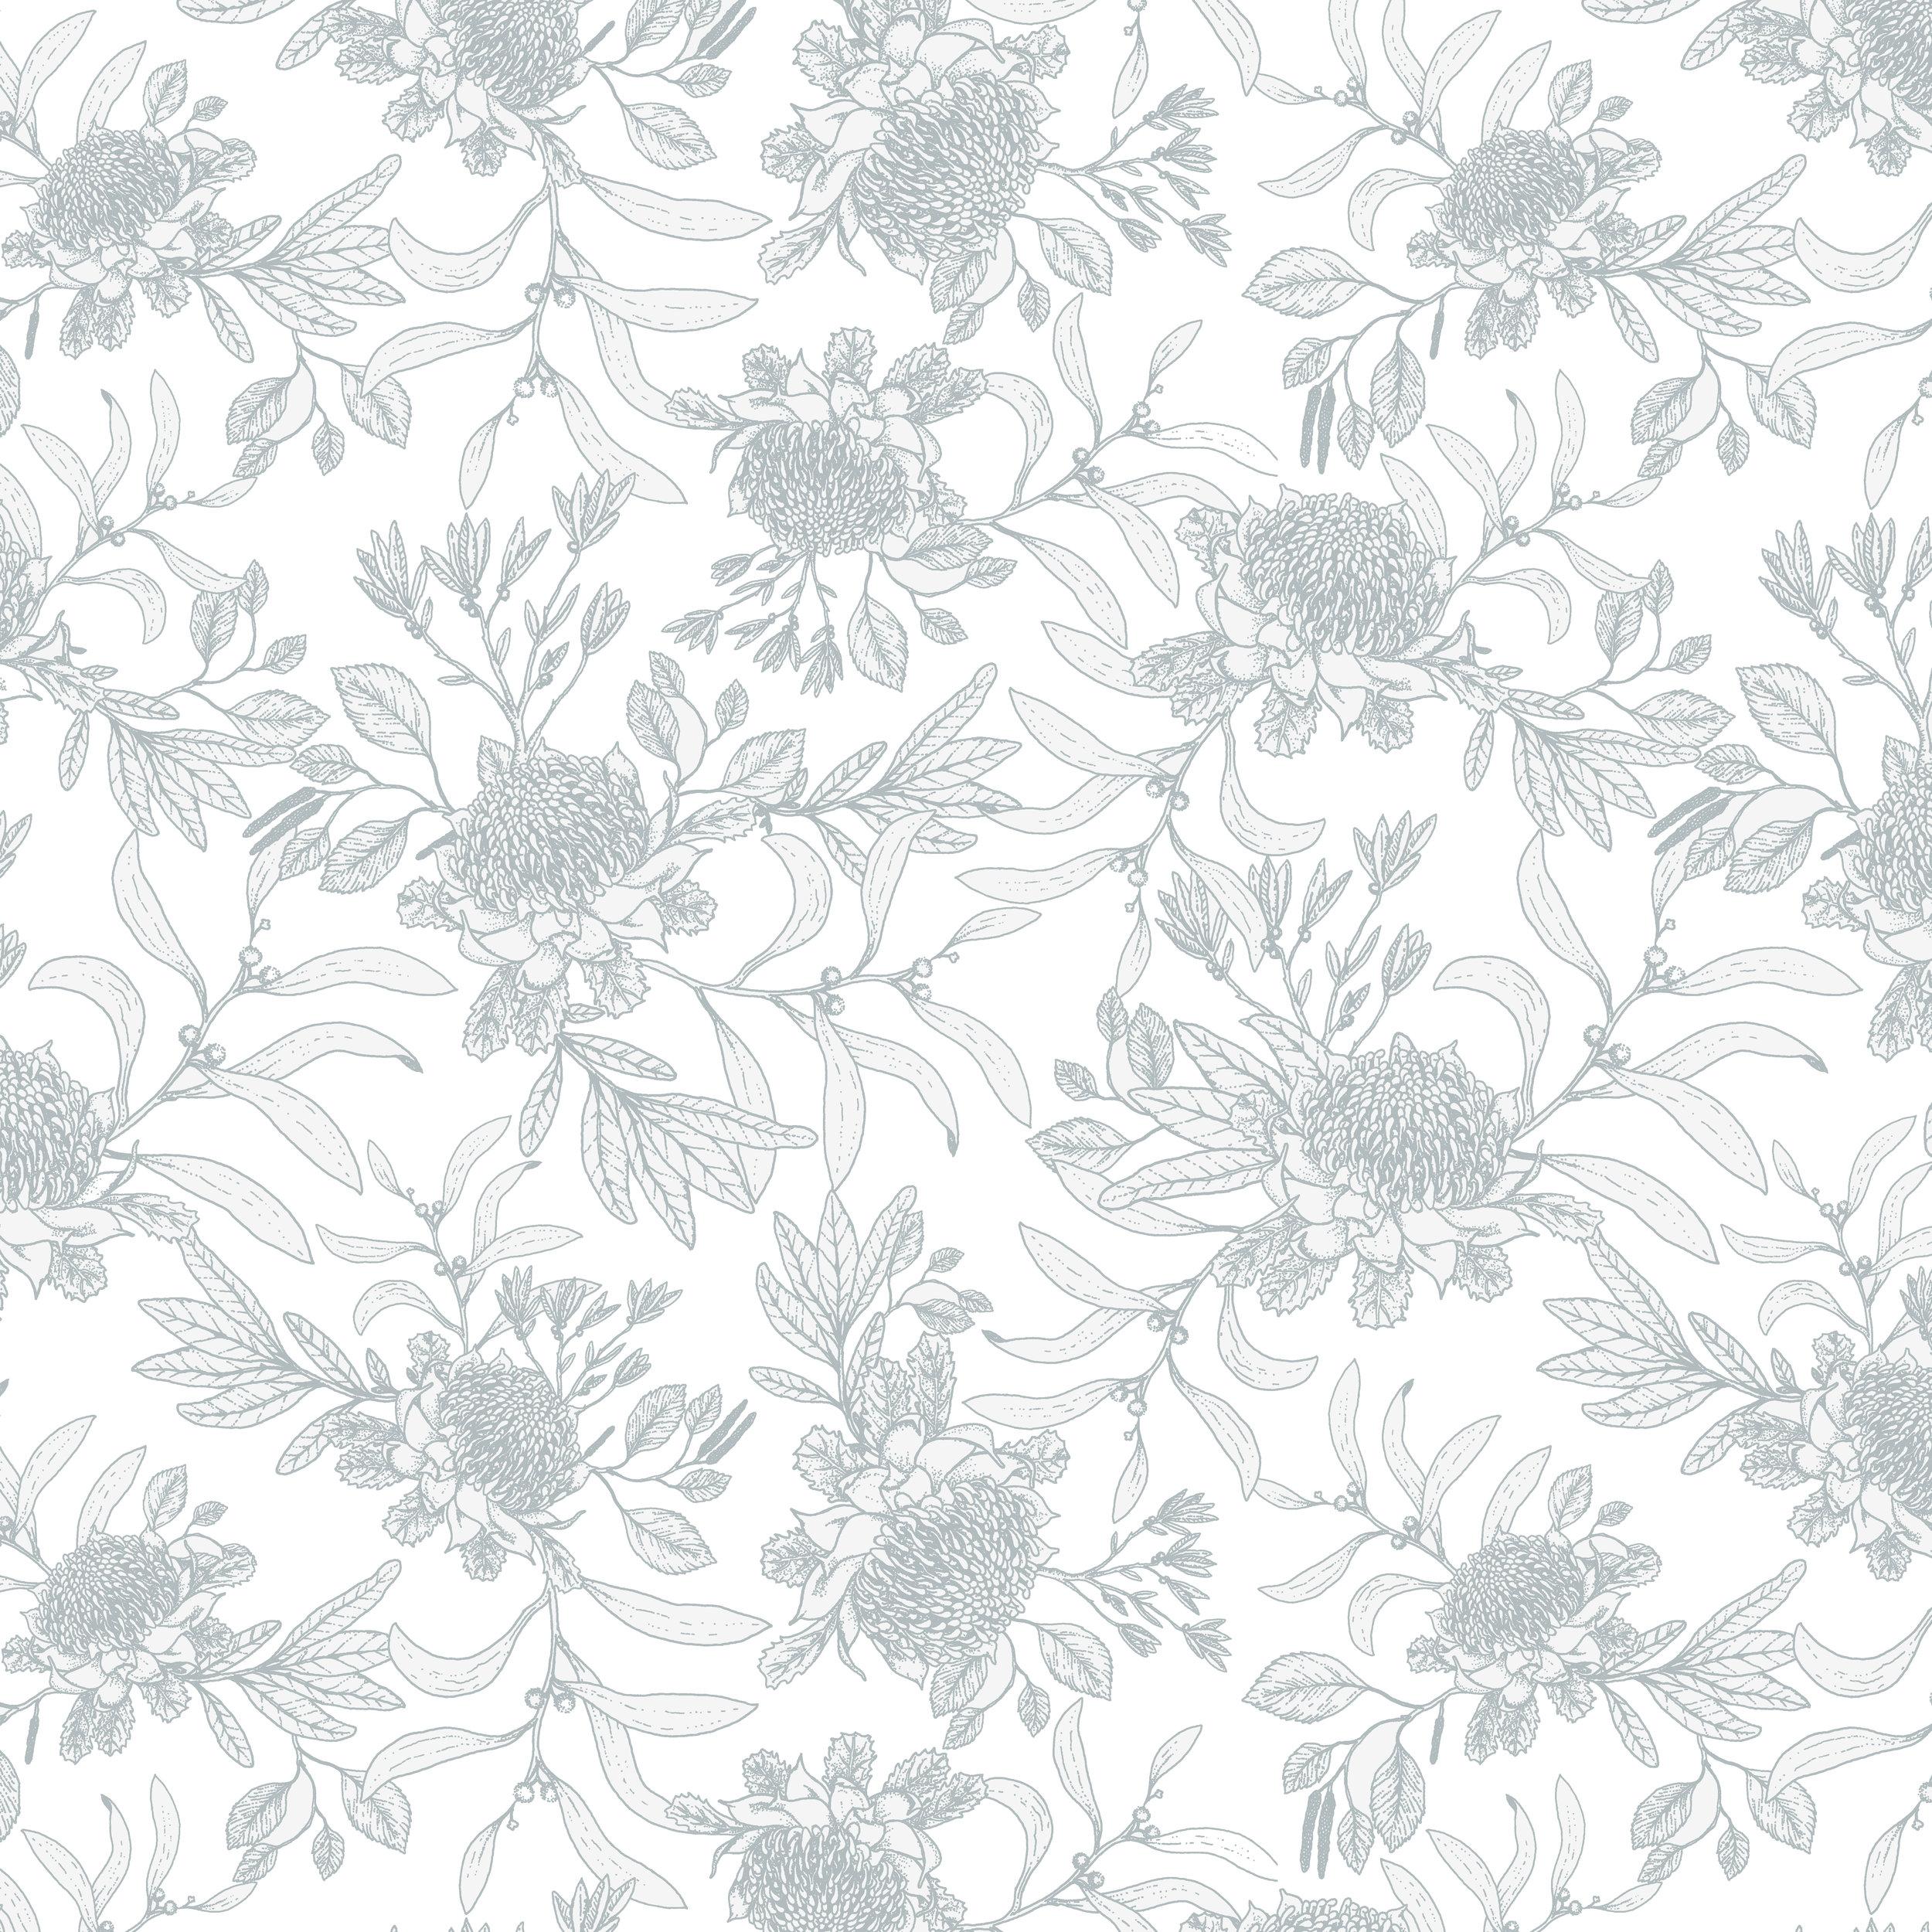 waratah outline 4.jpg